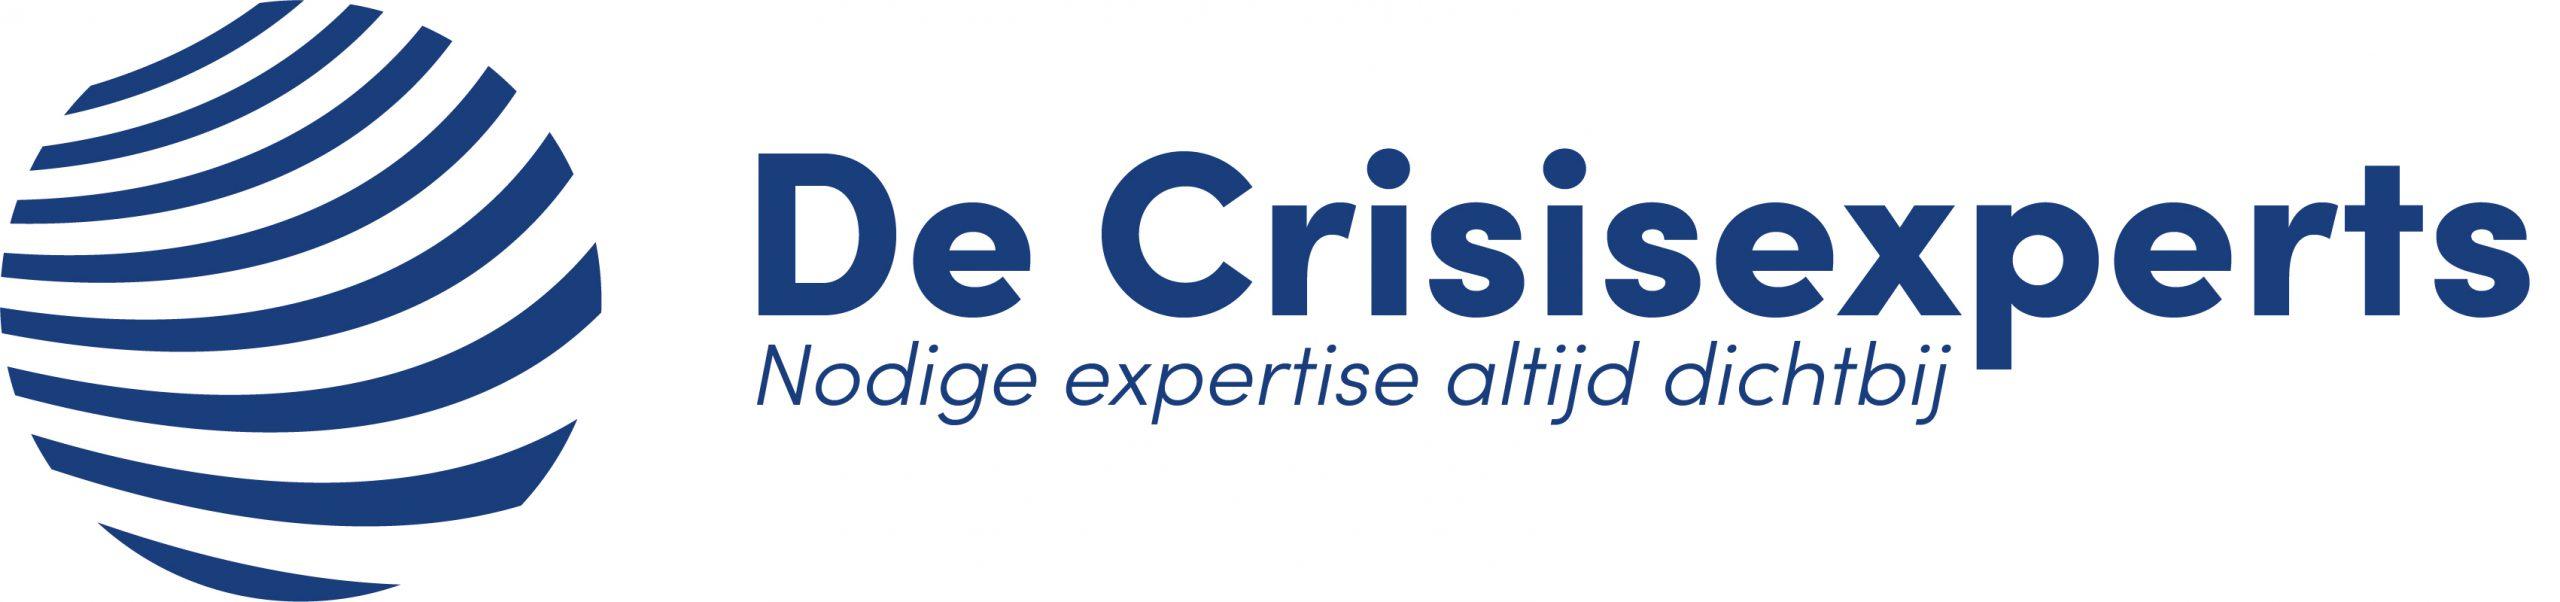 crisisexpert